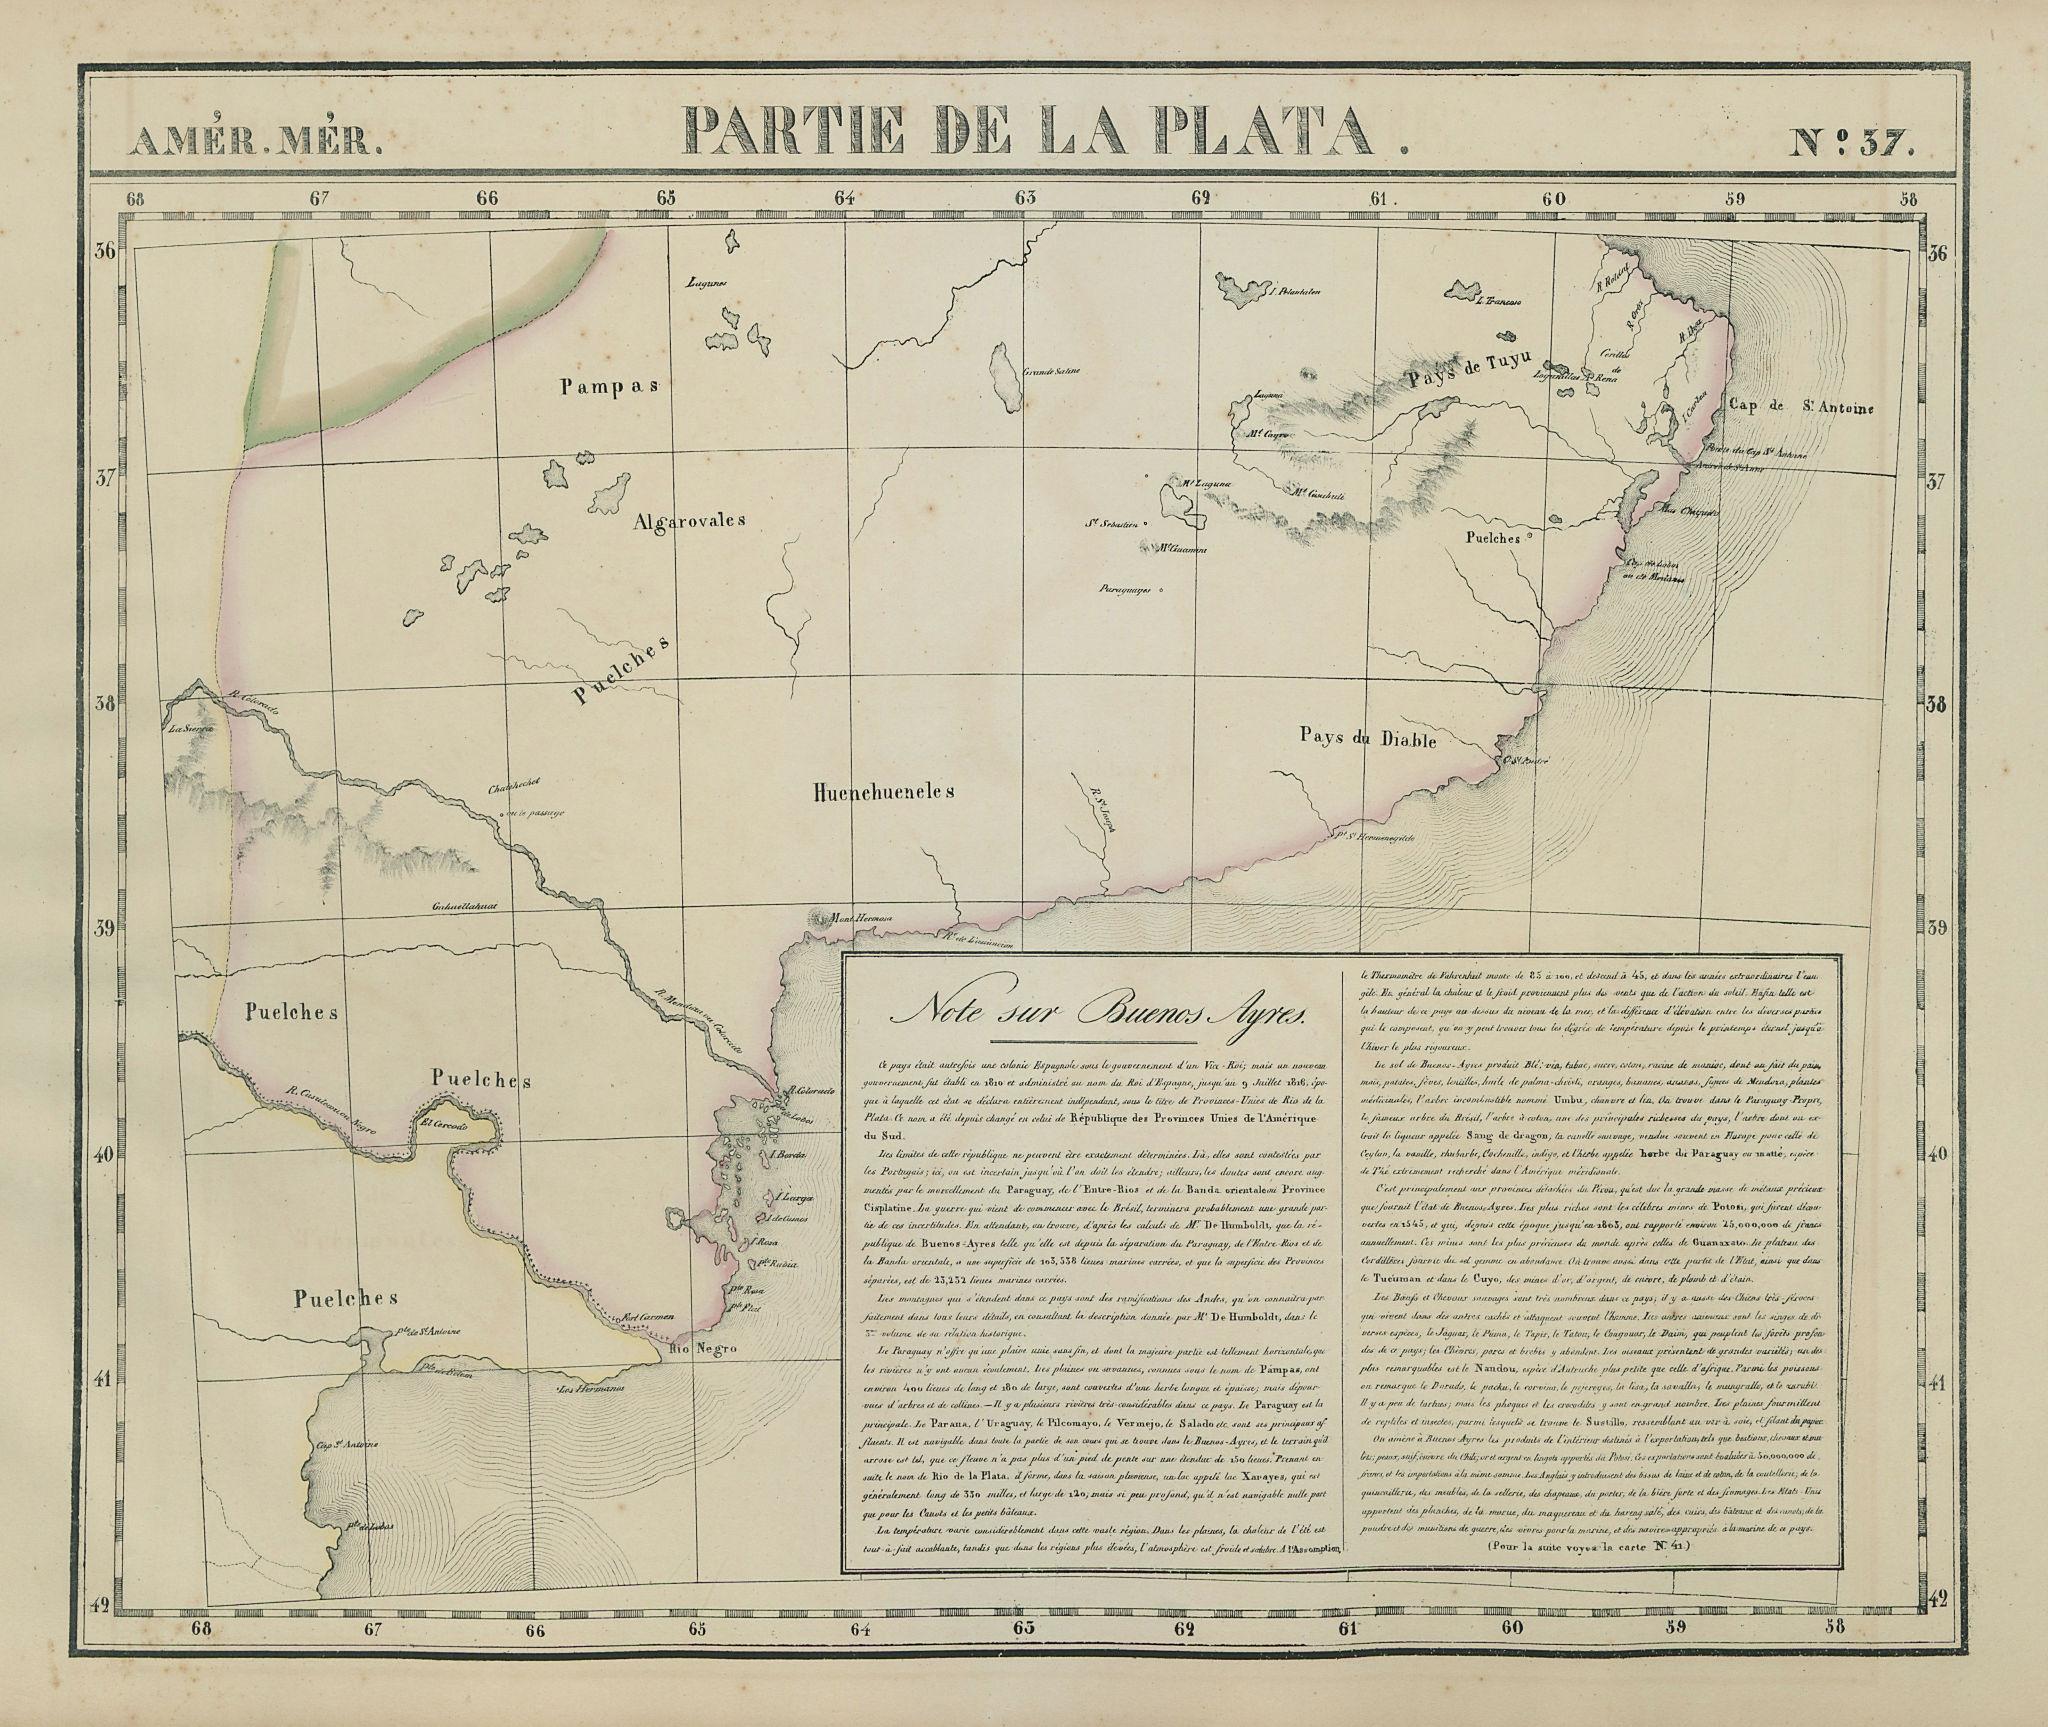 Amér Mér Plata #37 Argentina Buenos Aires Pampas Rio Negro VANDERMAELEN 1827 map